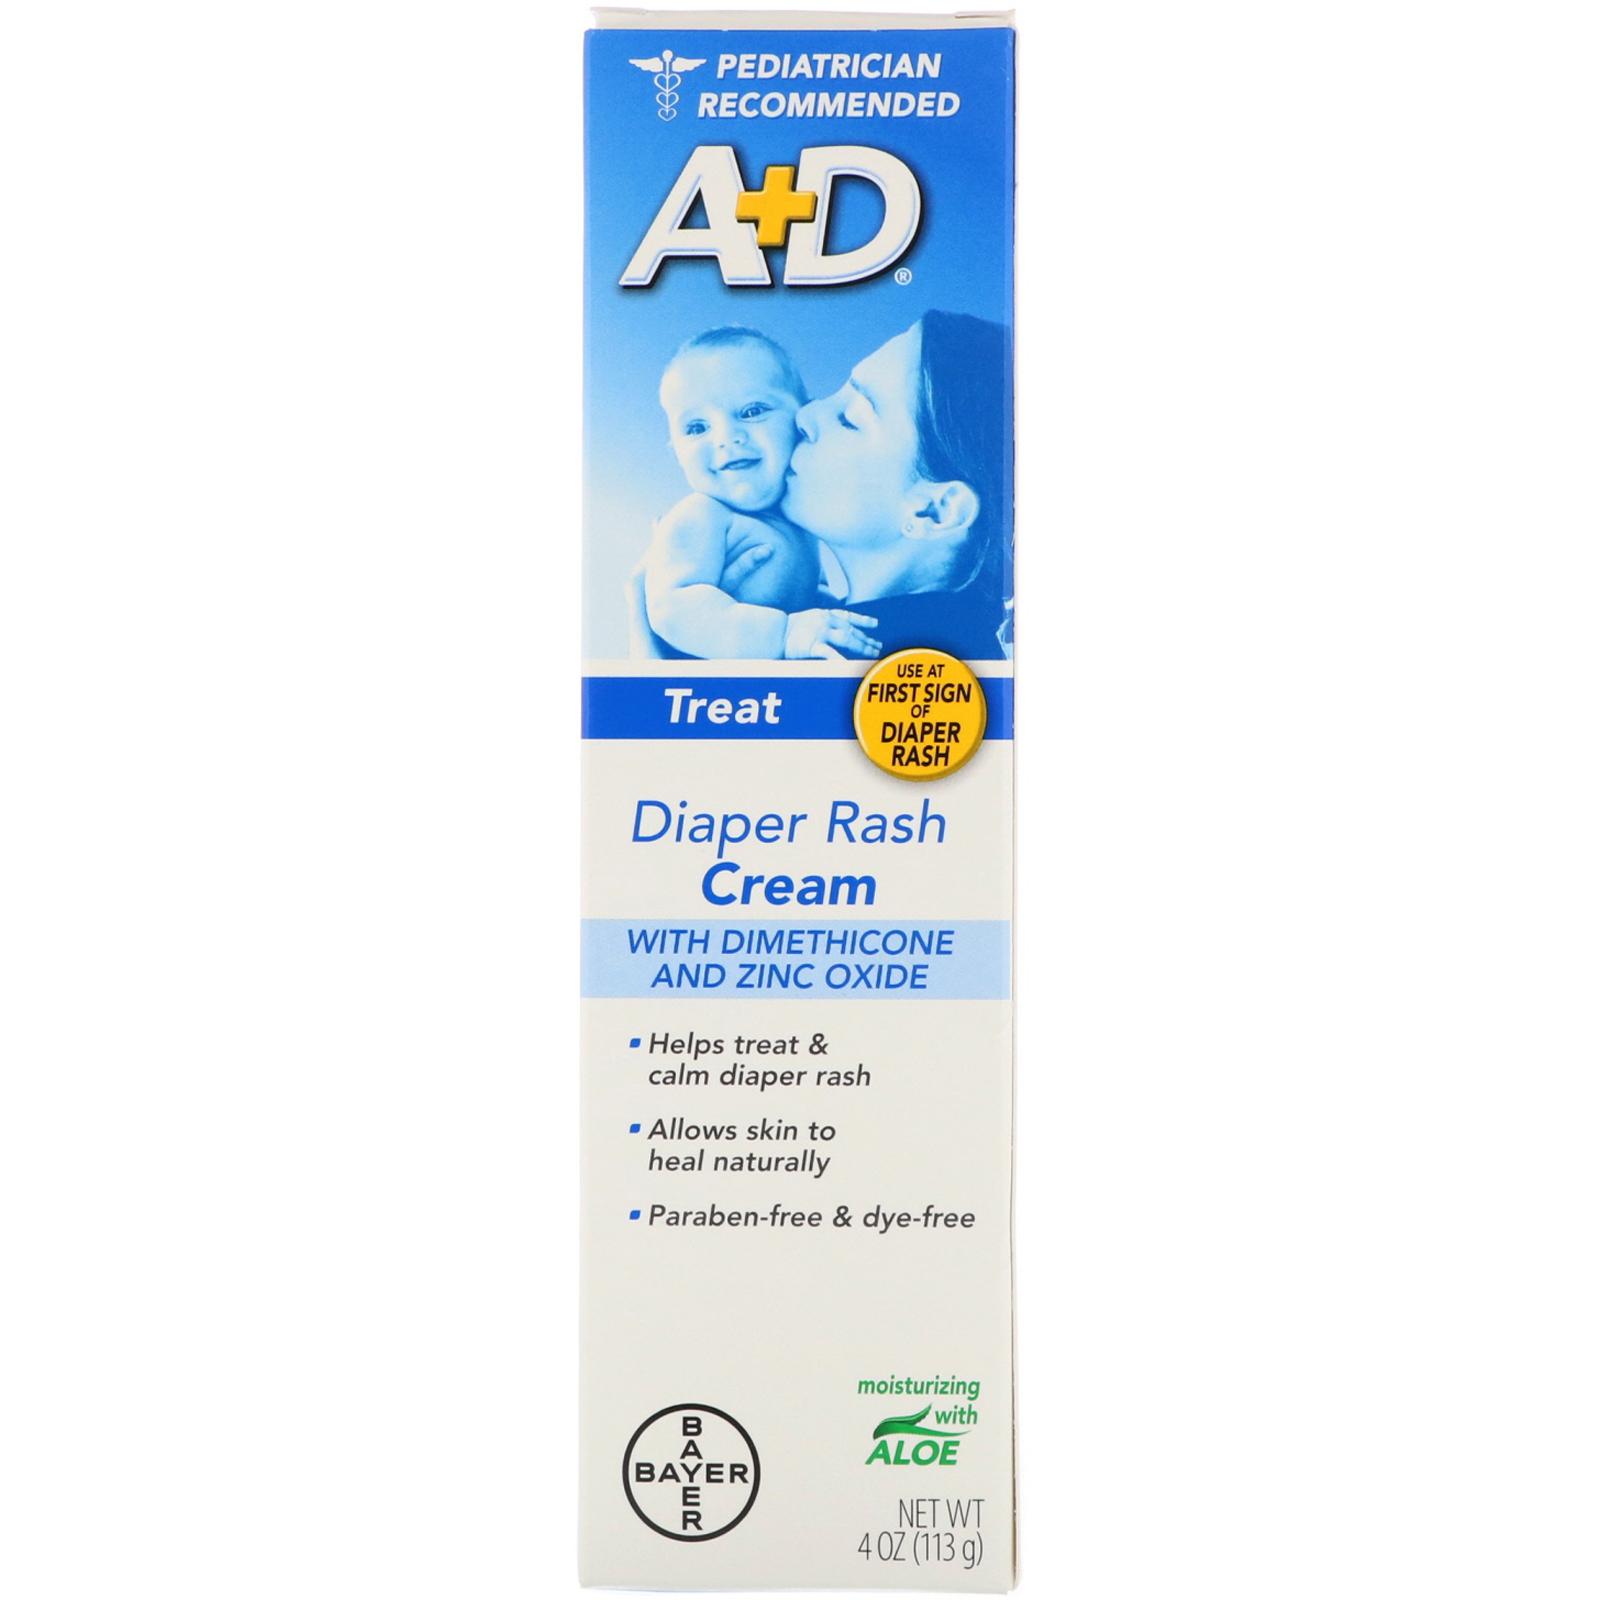 A D Diaper Rash Cream With Dimethicone And Zinc Oxide 4